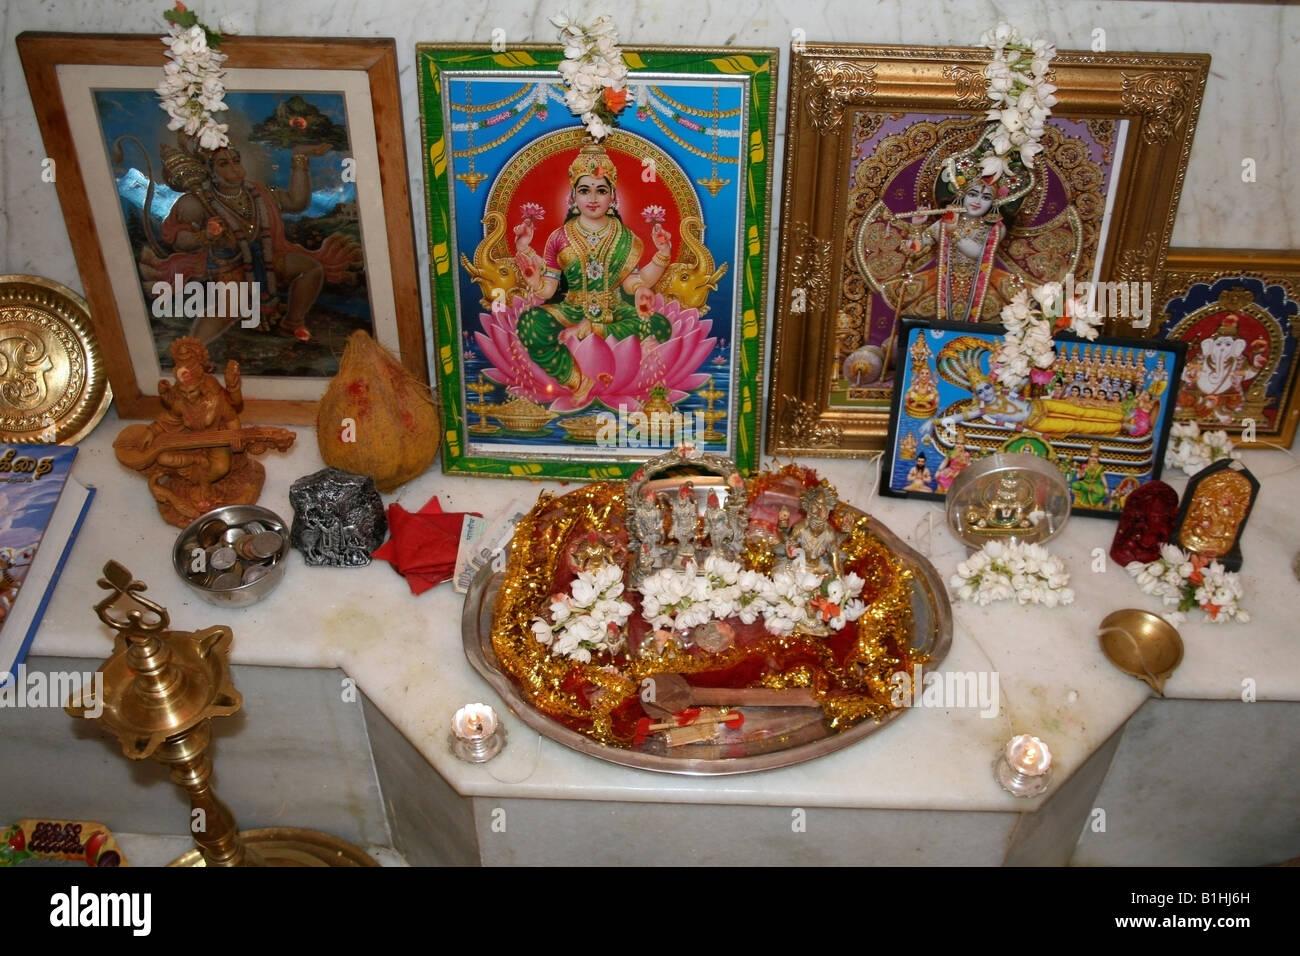 Best Kitchen Gallery: Home Shrine Offerings Stock Photos Home Shrine Offerings Stock of Hindu Altar At Home on rachelxblog.com